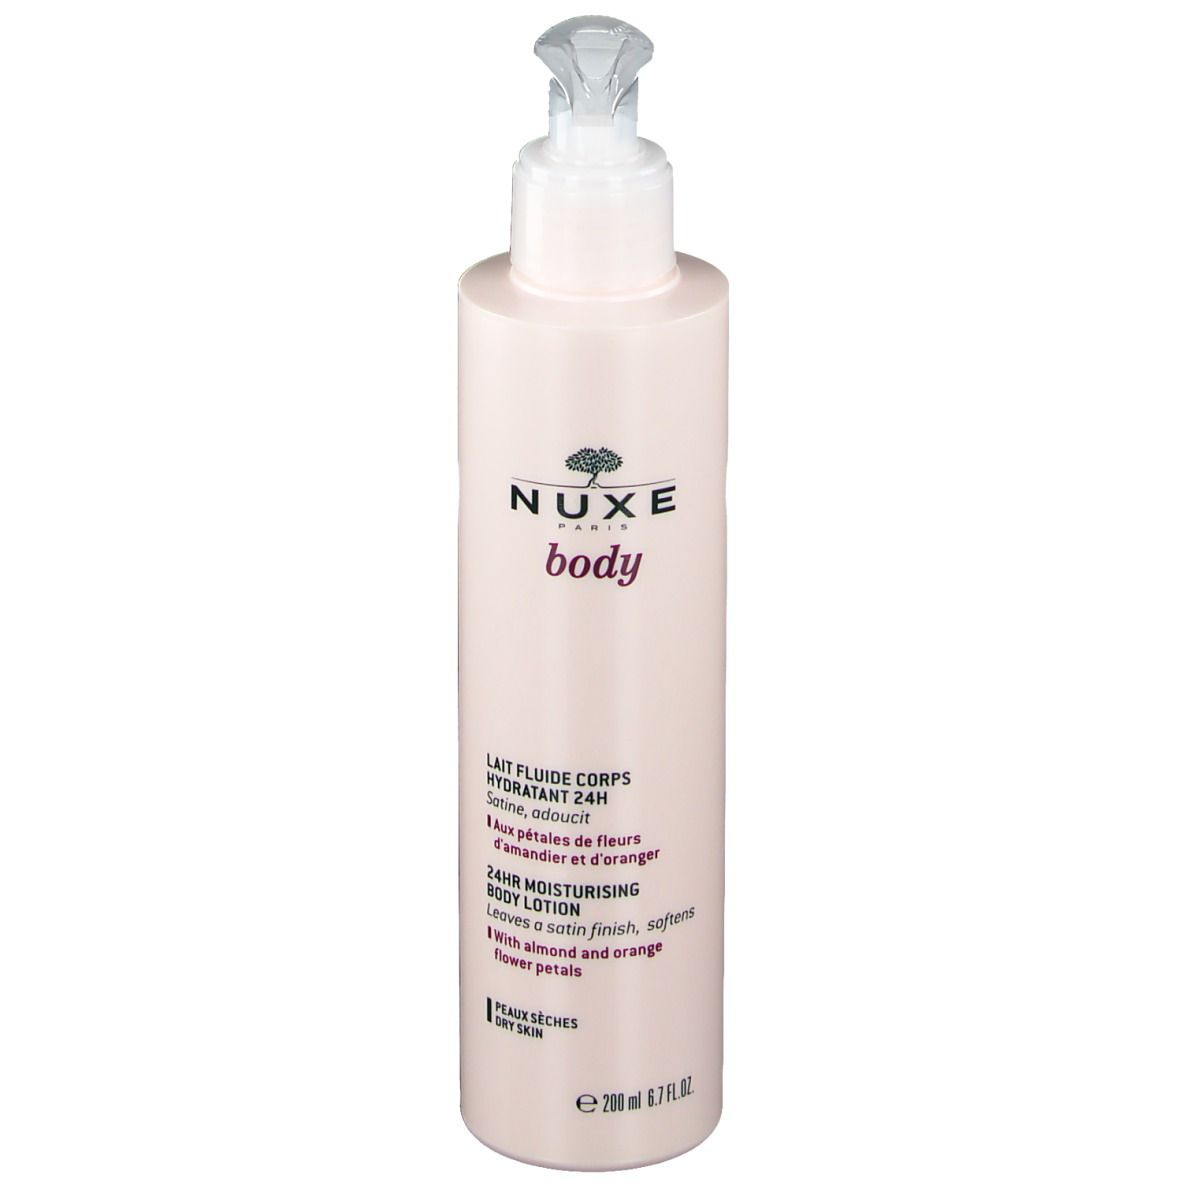 Nuxe Body Lait fluide corps hydratant 24h